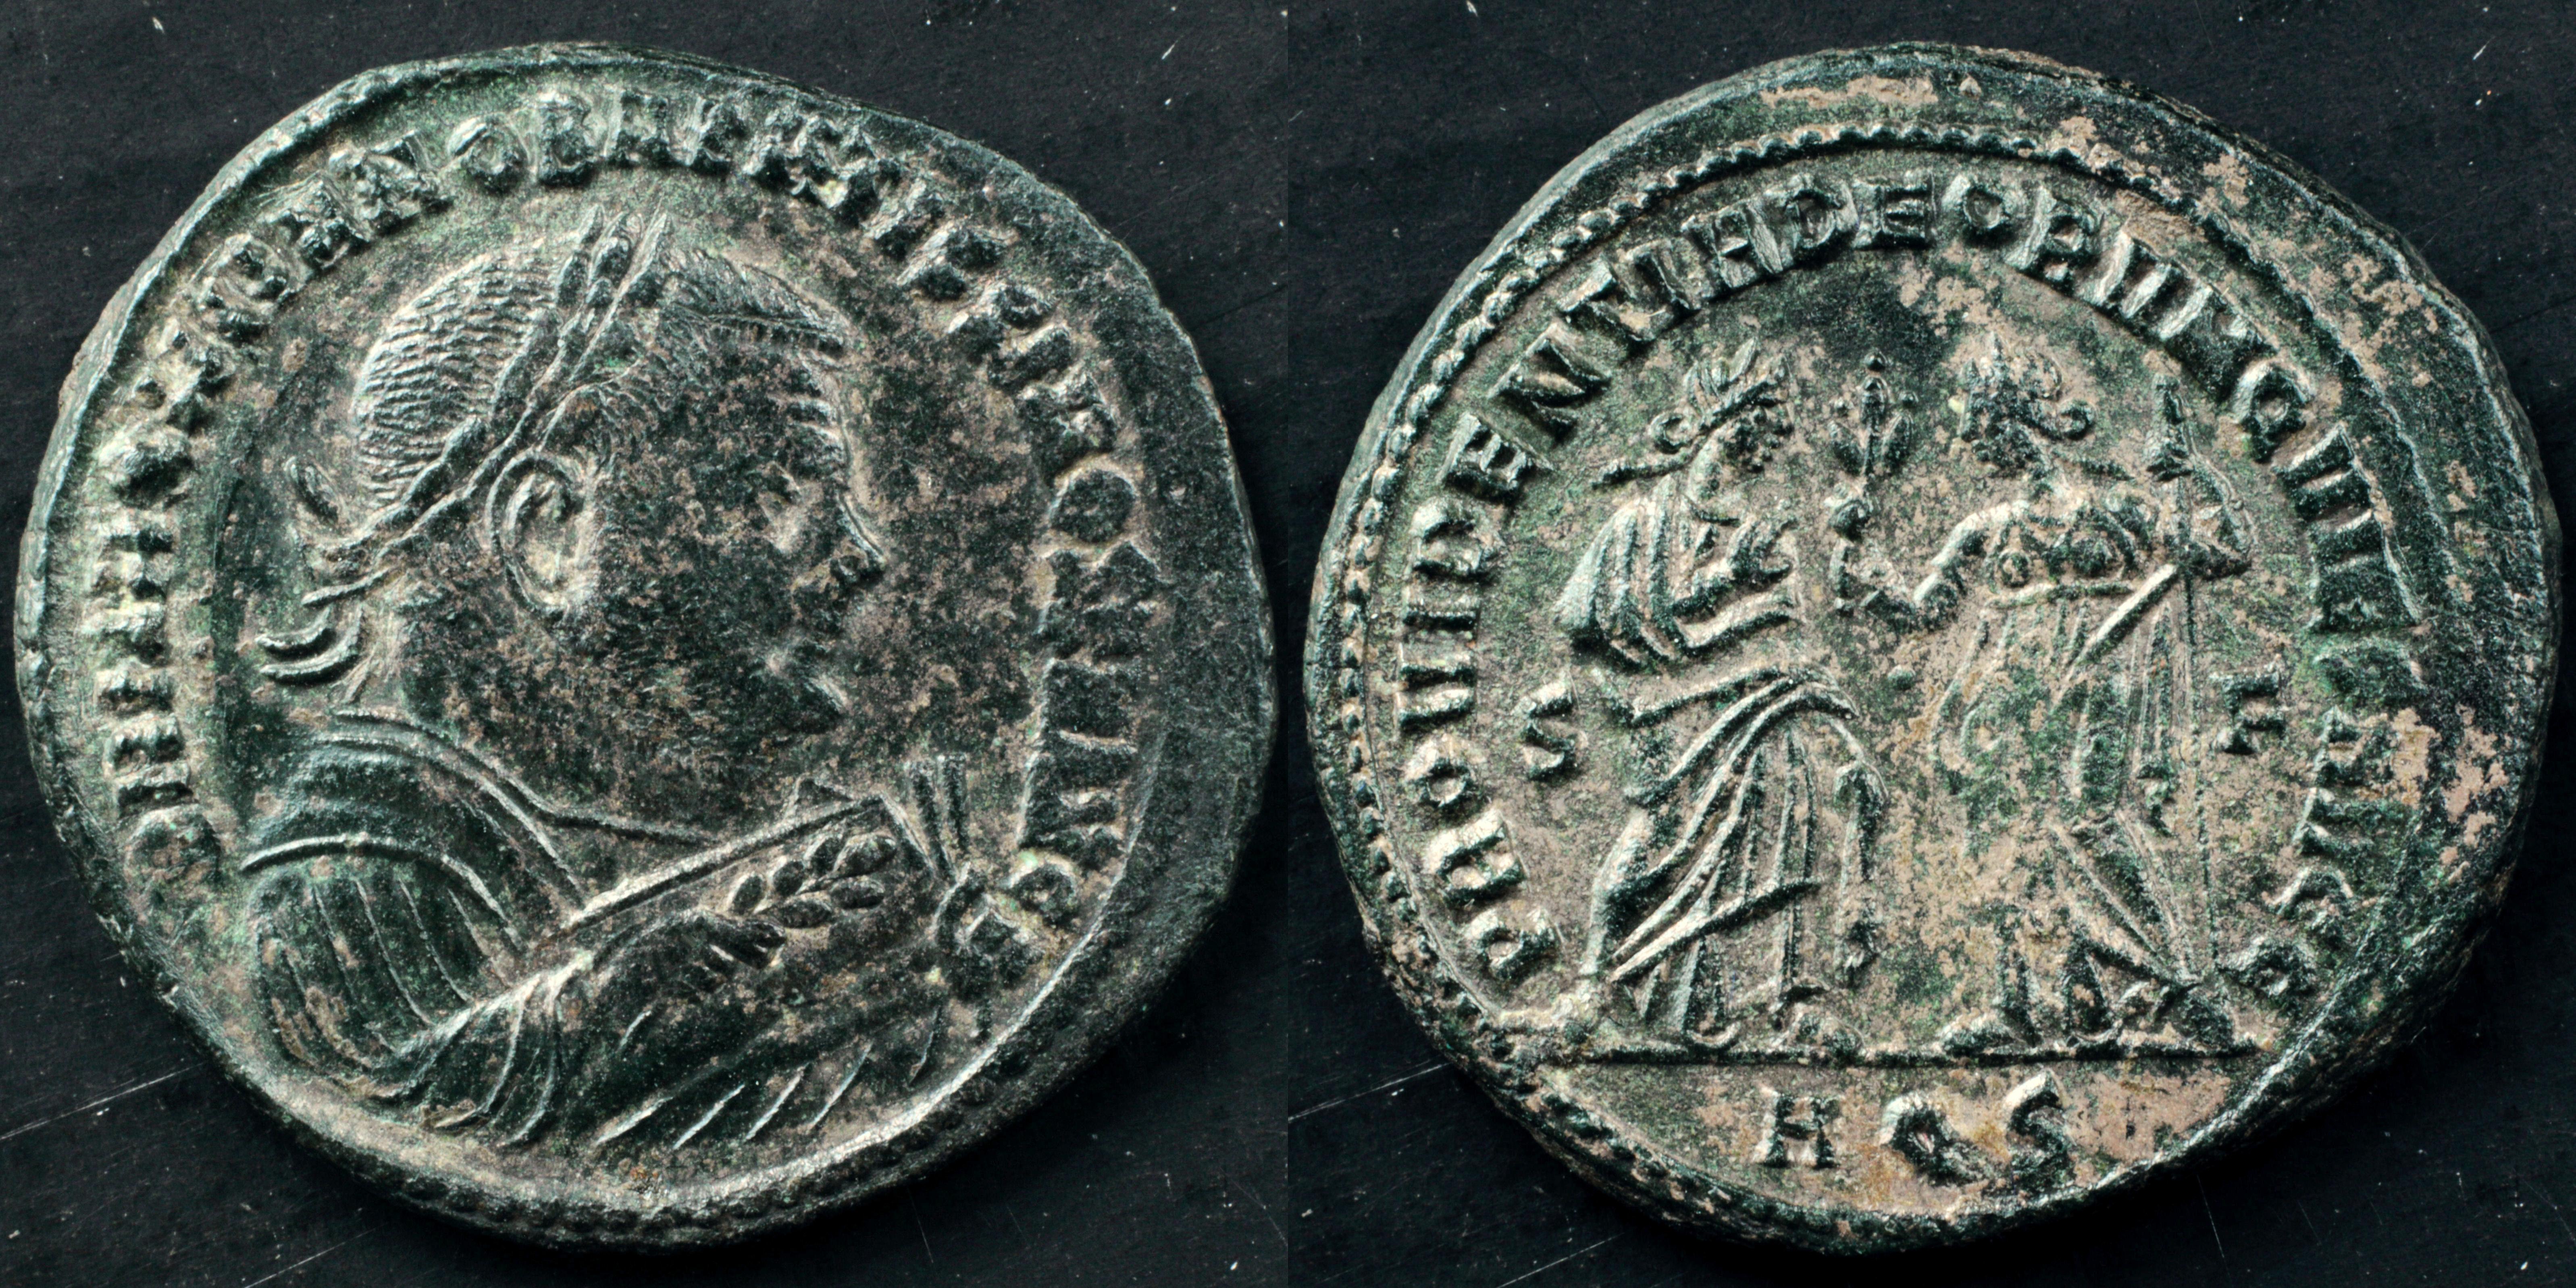 Byzantine (300-1400 Ad) Faithful Byzantine Empire Maurice Tiberius Follis Constantinople Ae 30 Nice Coin Coins & Paper Money